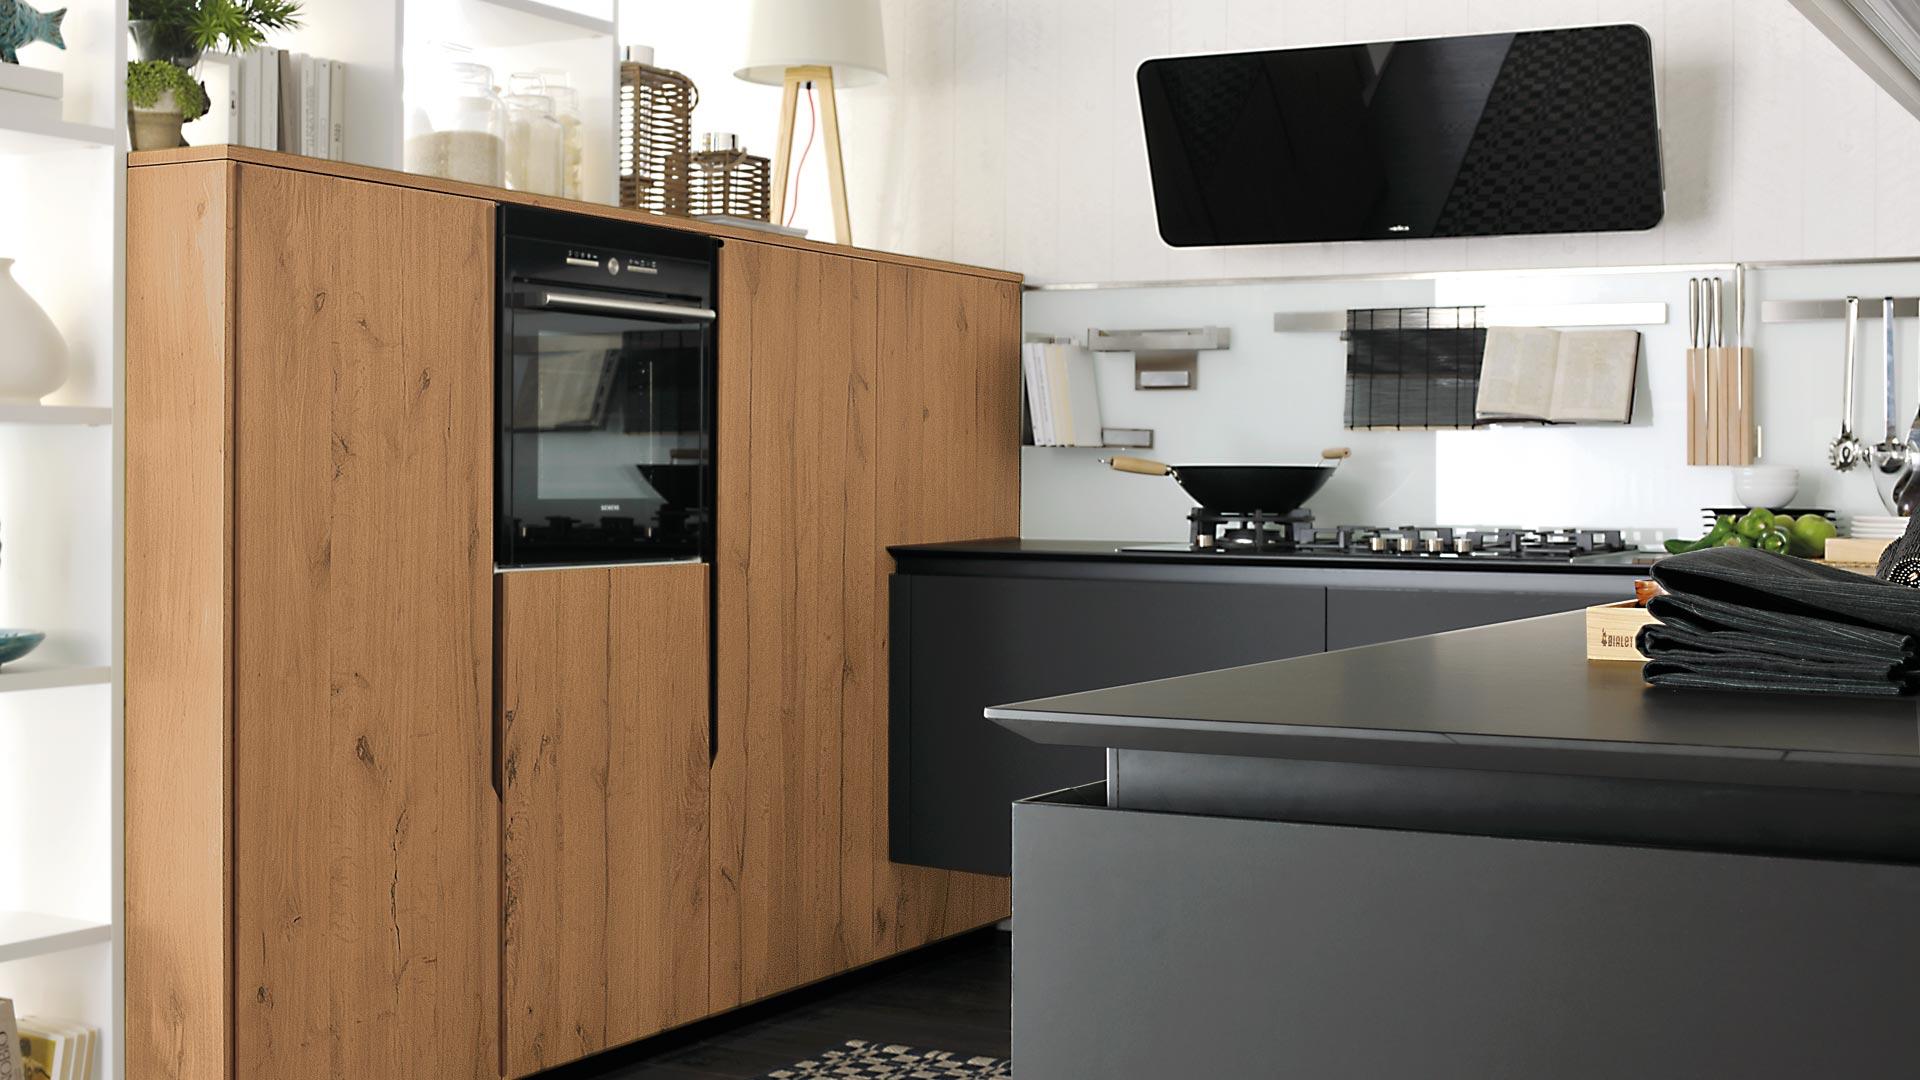 Oltre - Cucine Moderne - Cucine Lube